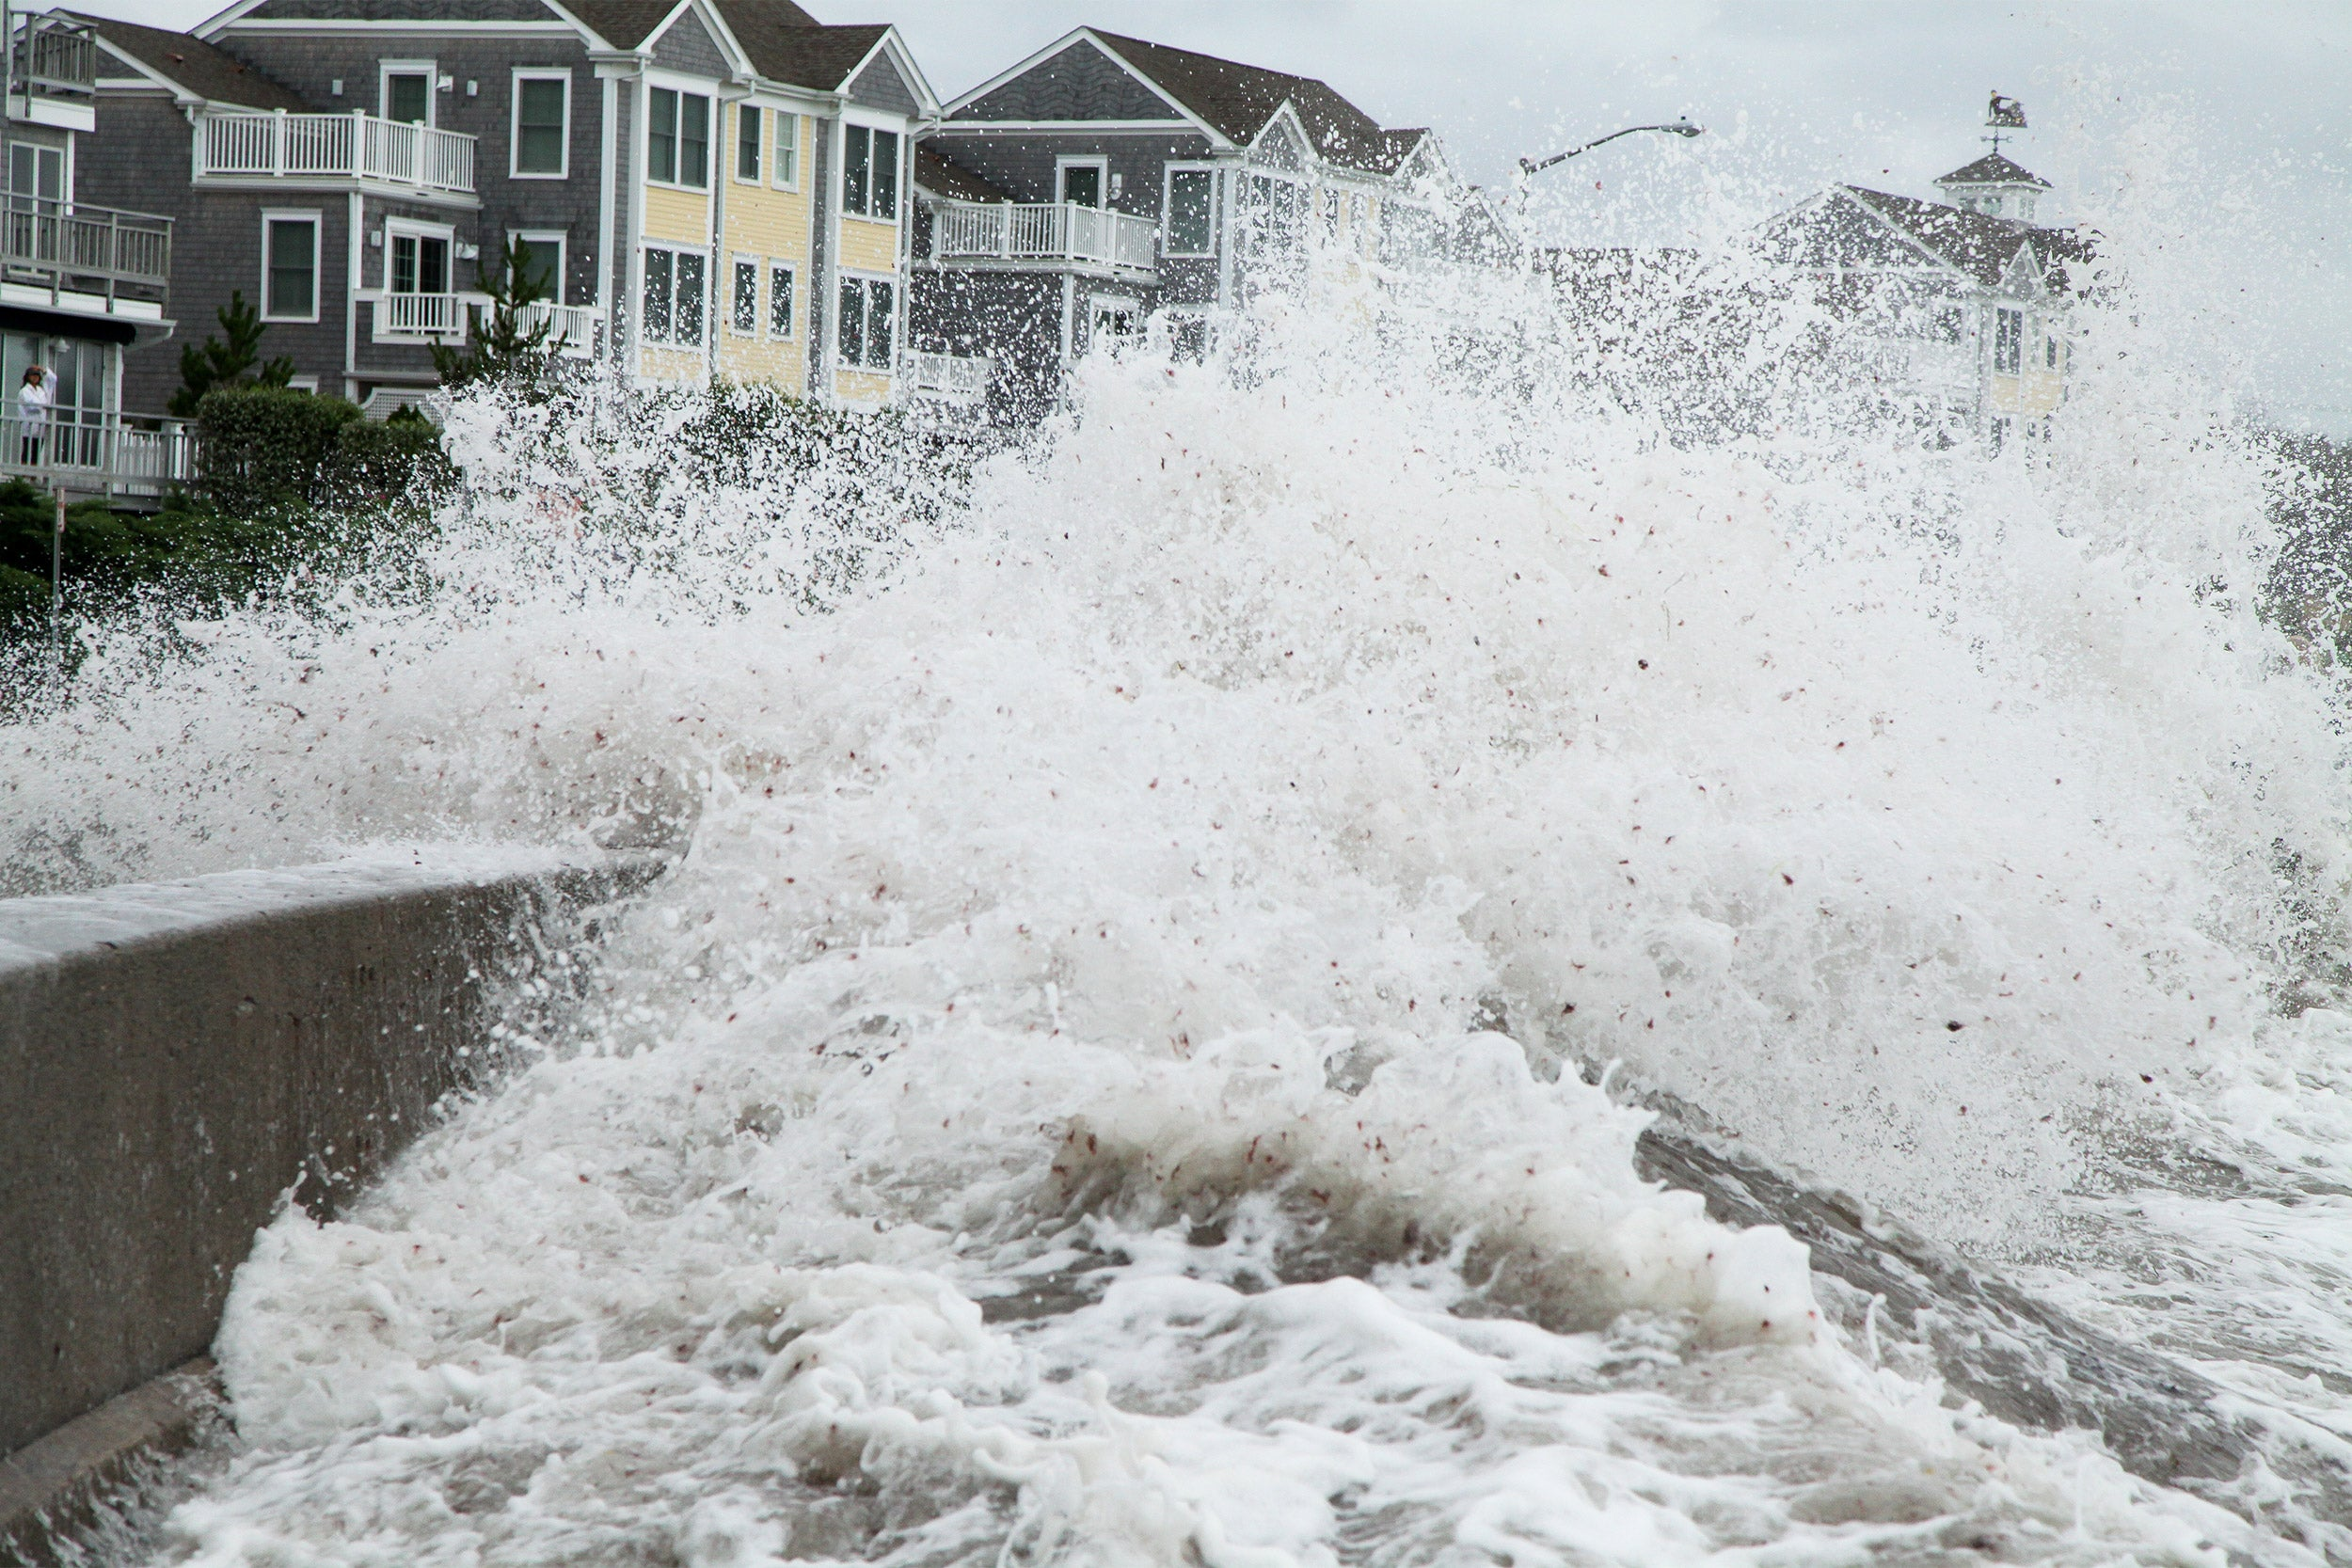 Storm surge hitting houses along coast.